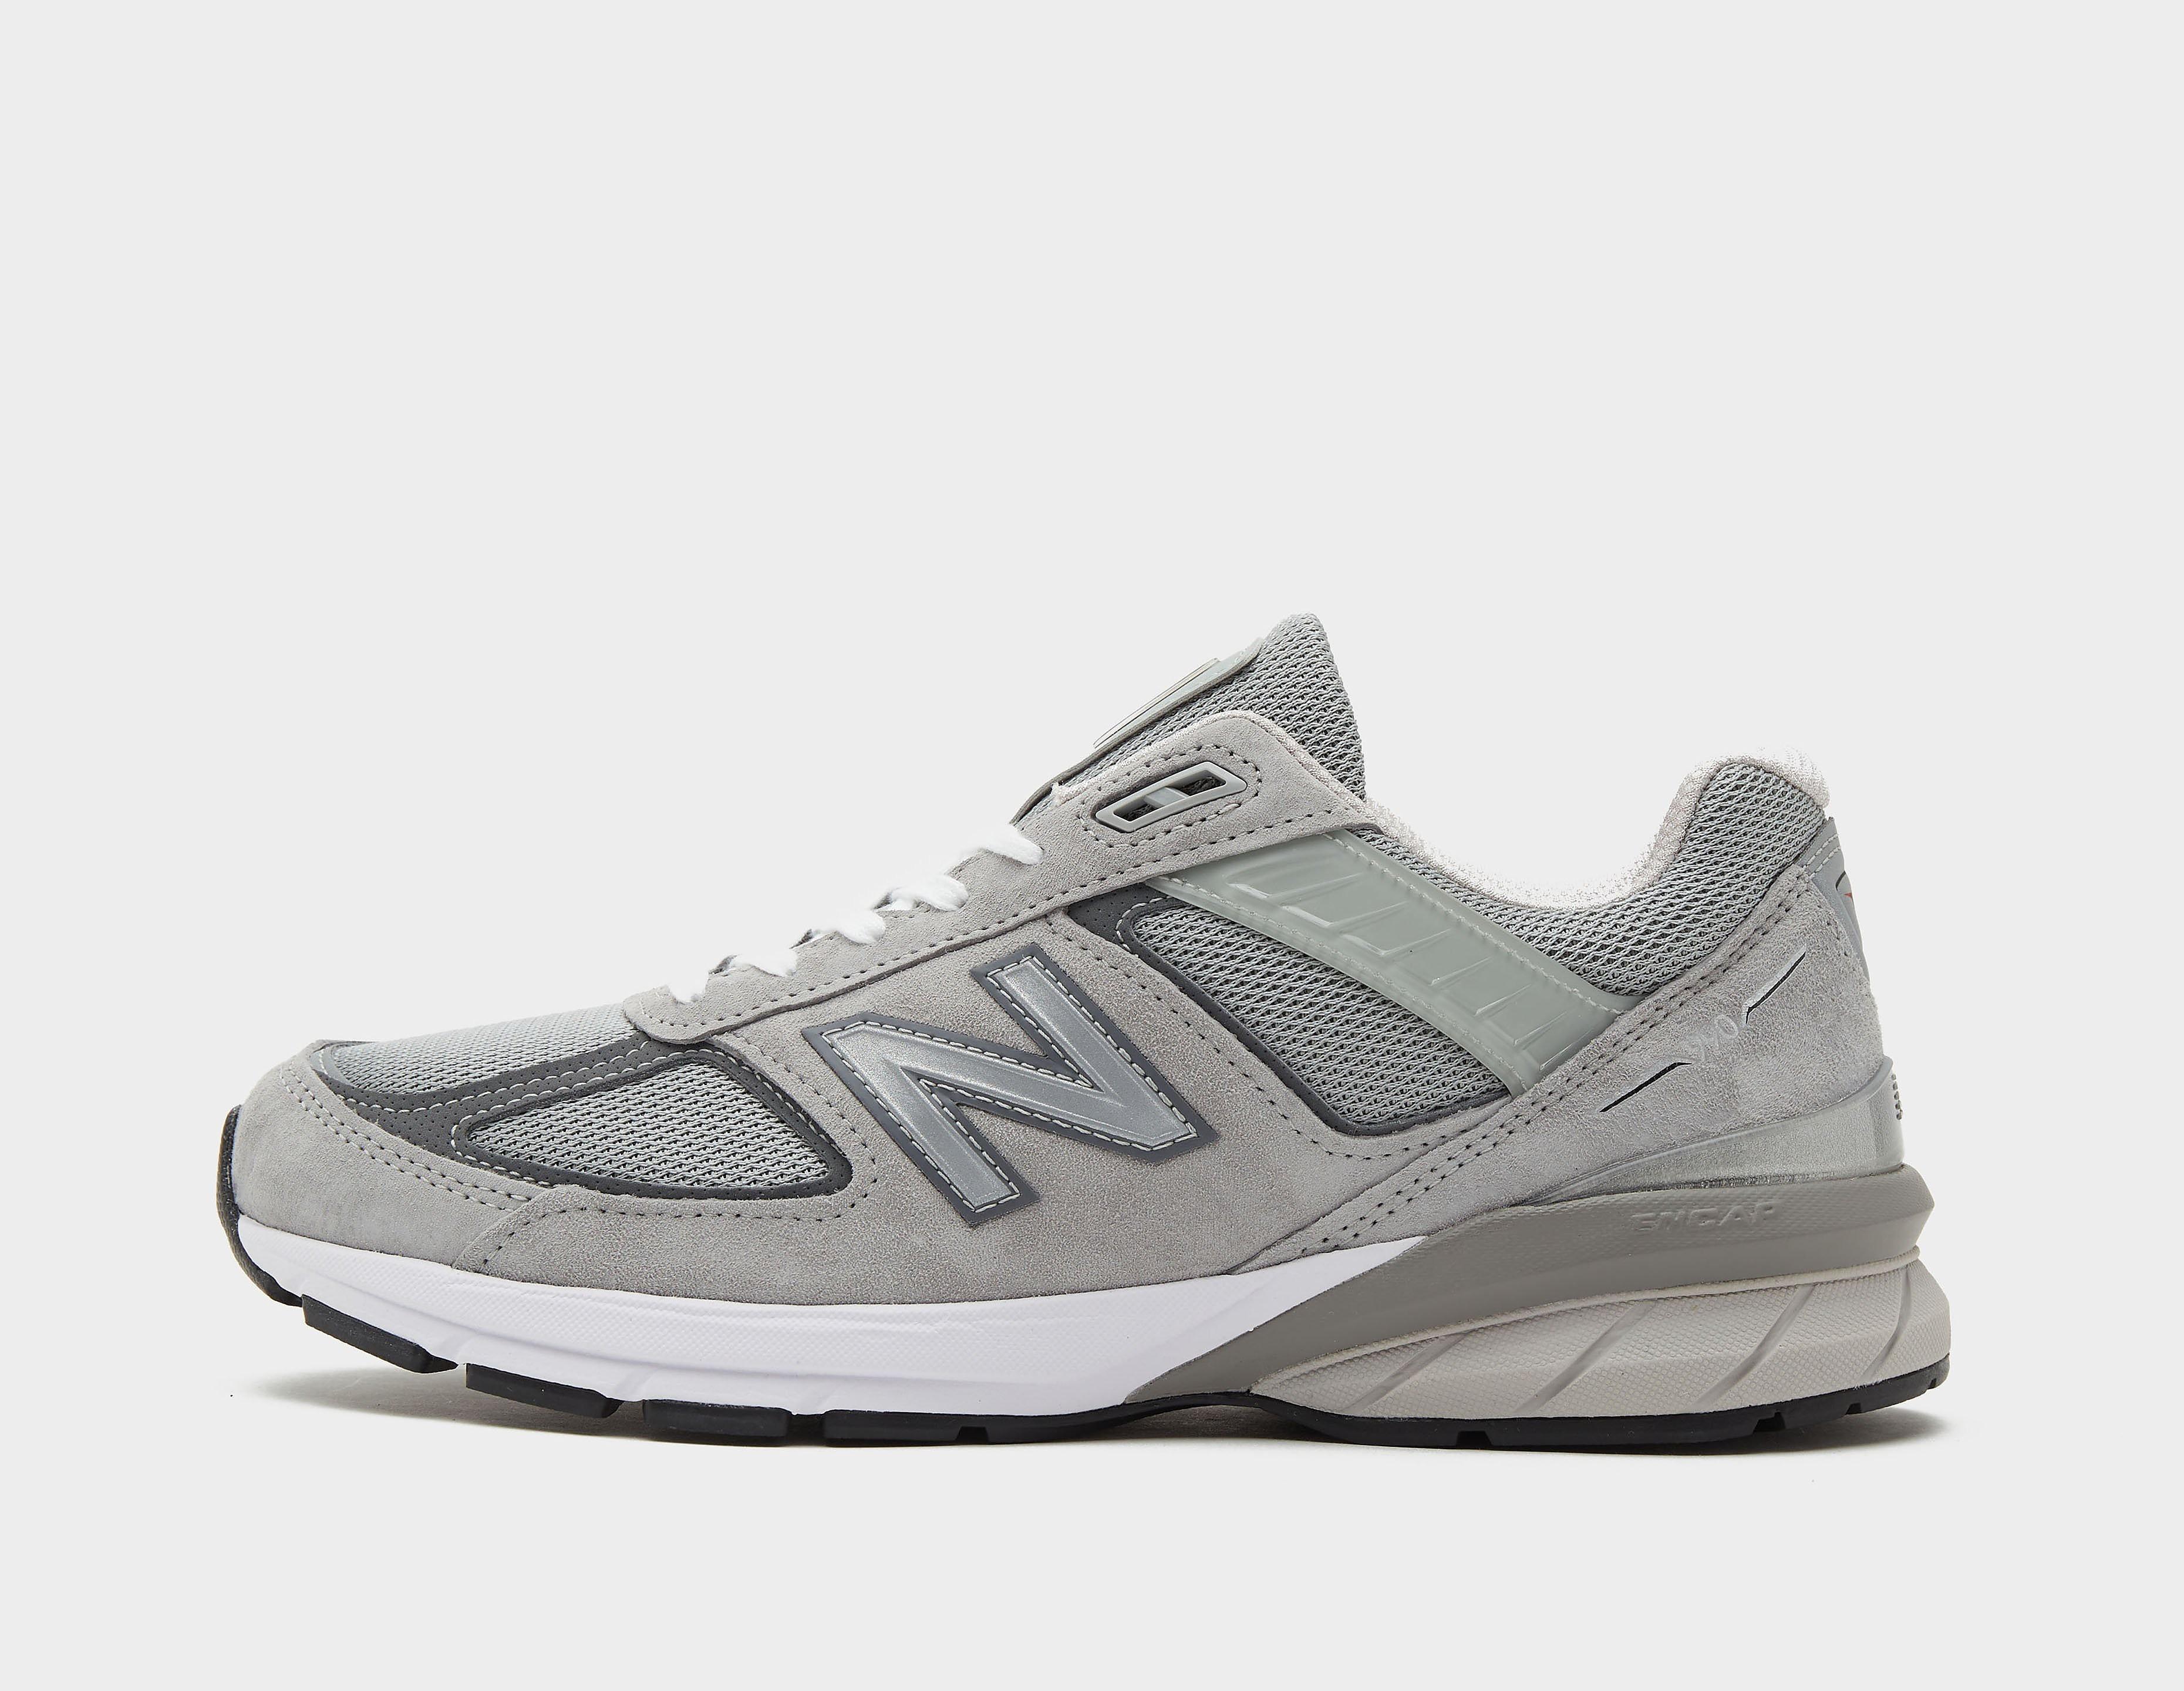 6edfd650fea374 New Balance - London Trend